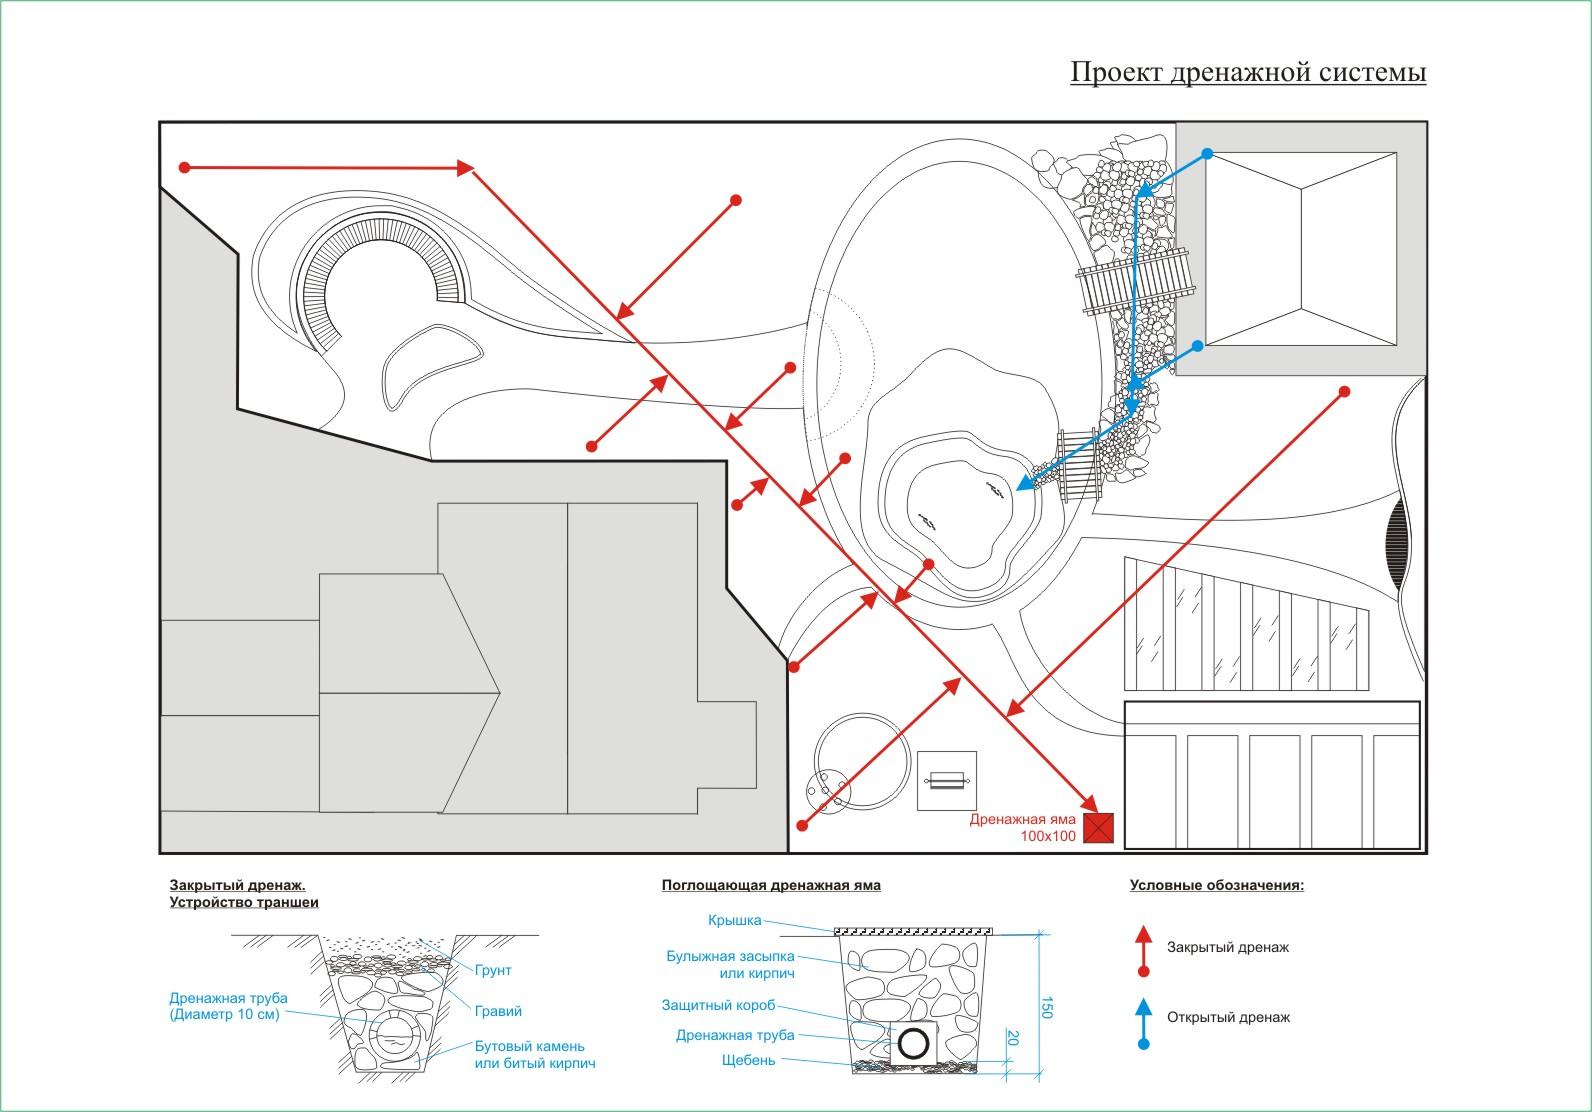 Схемы дренажа участка